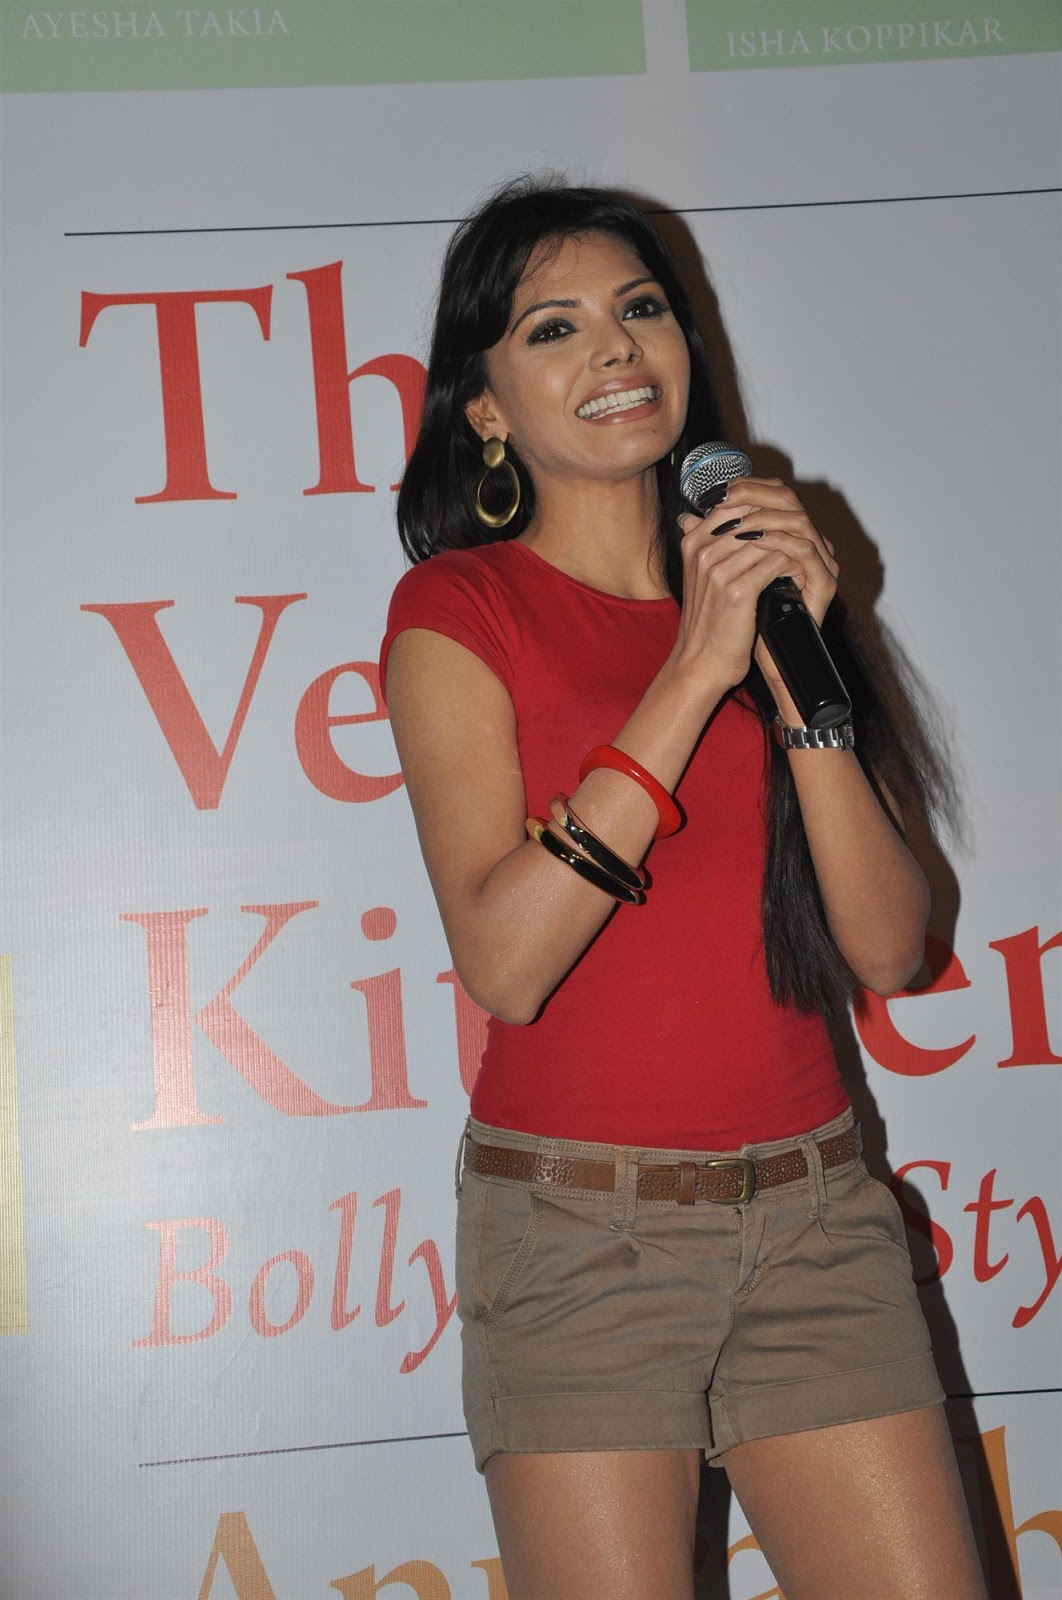 High Quality Bollywood Celebrity Pictures Sherlyn Chopra -6736